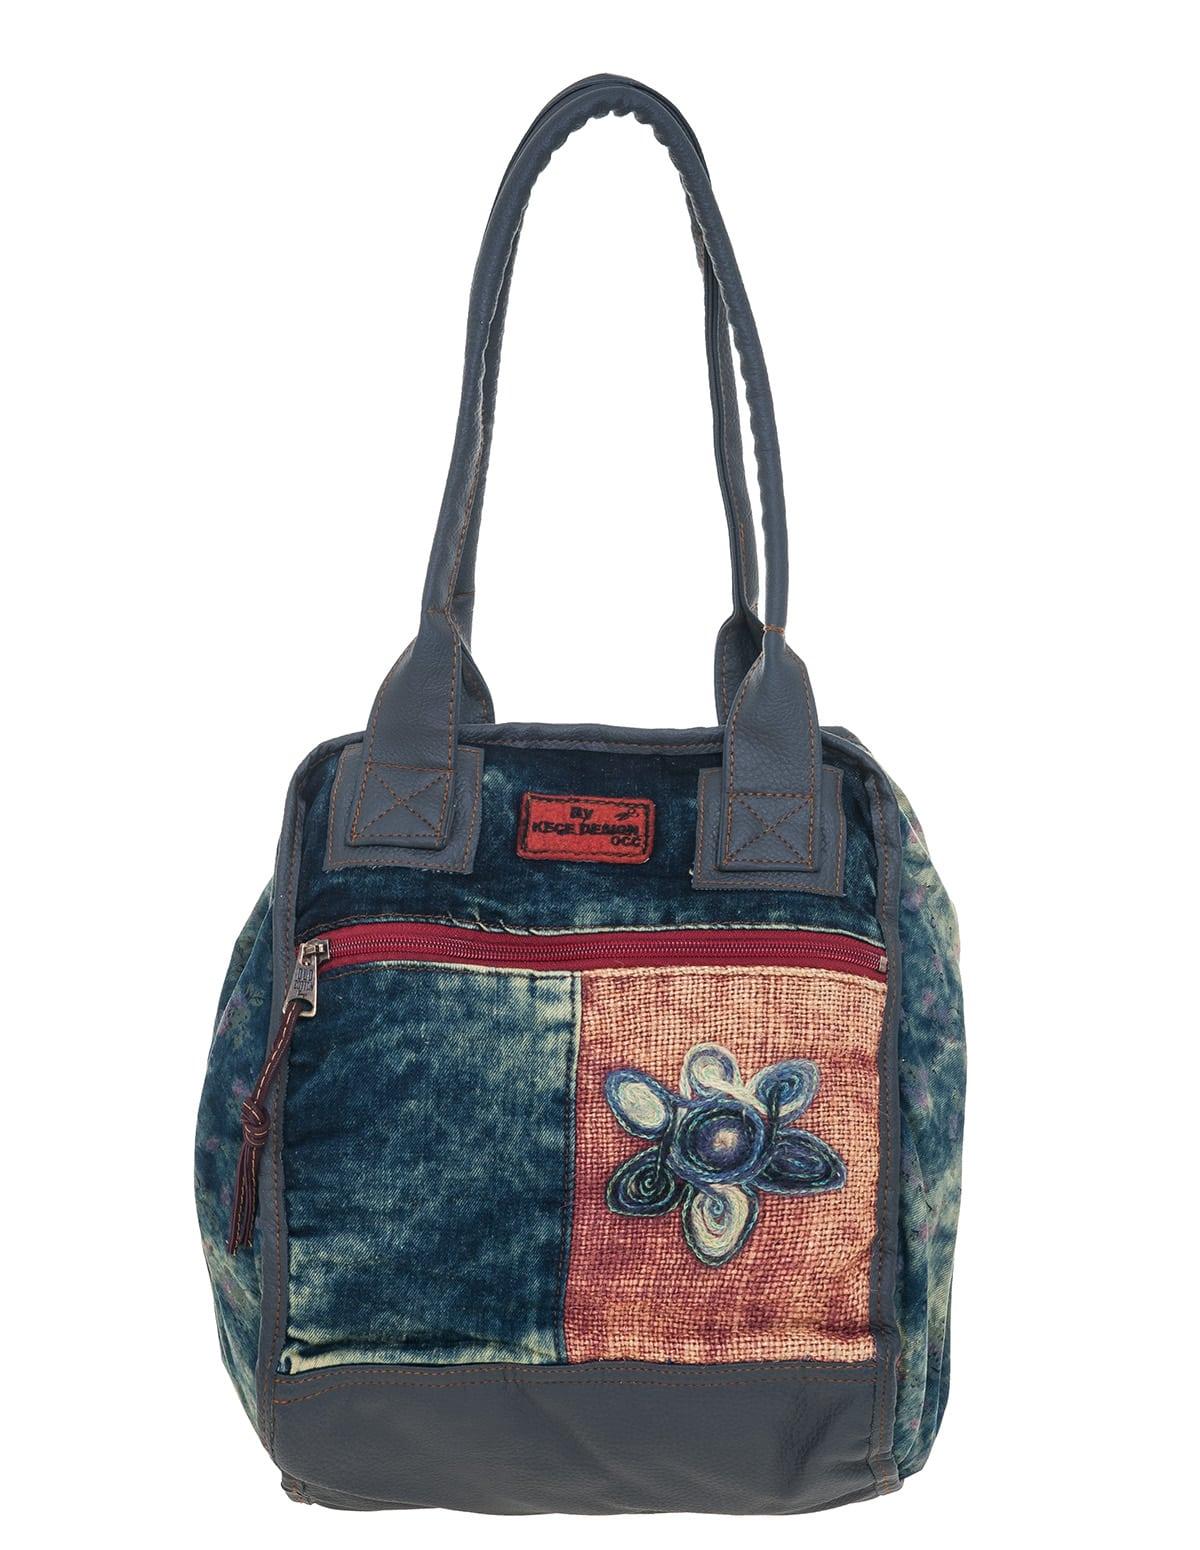 7c660237c6 Υφασμάτινη χειροποίητη τσάντα ώμου - vactive.gr